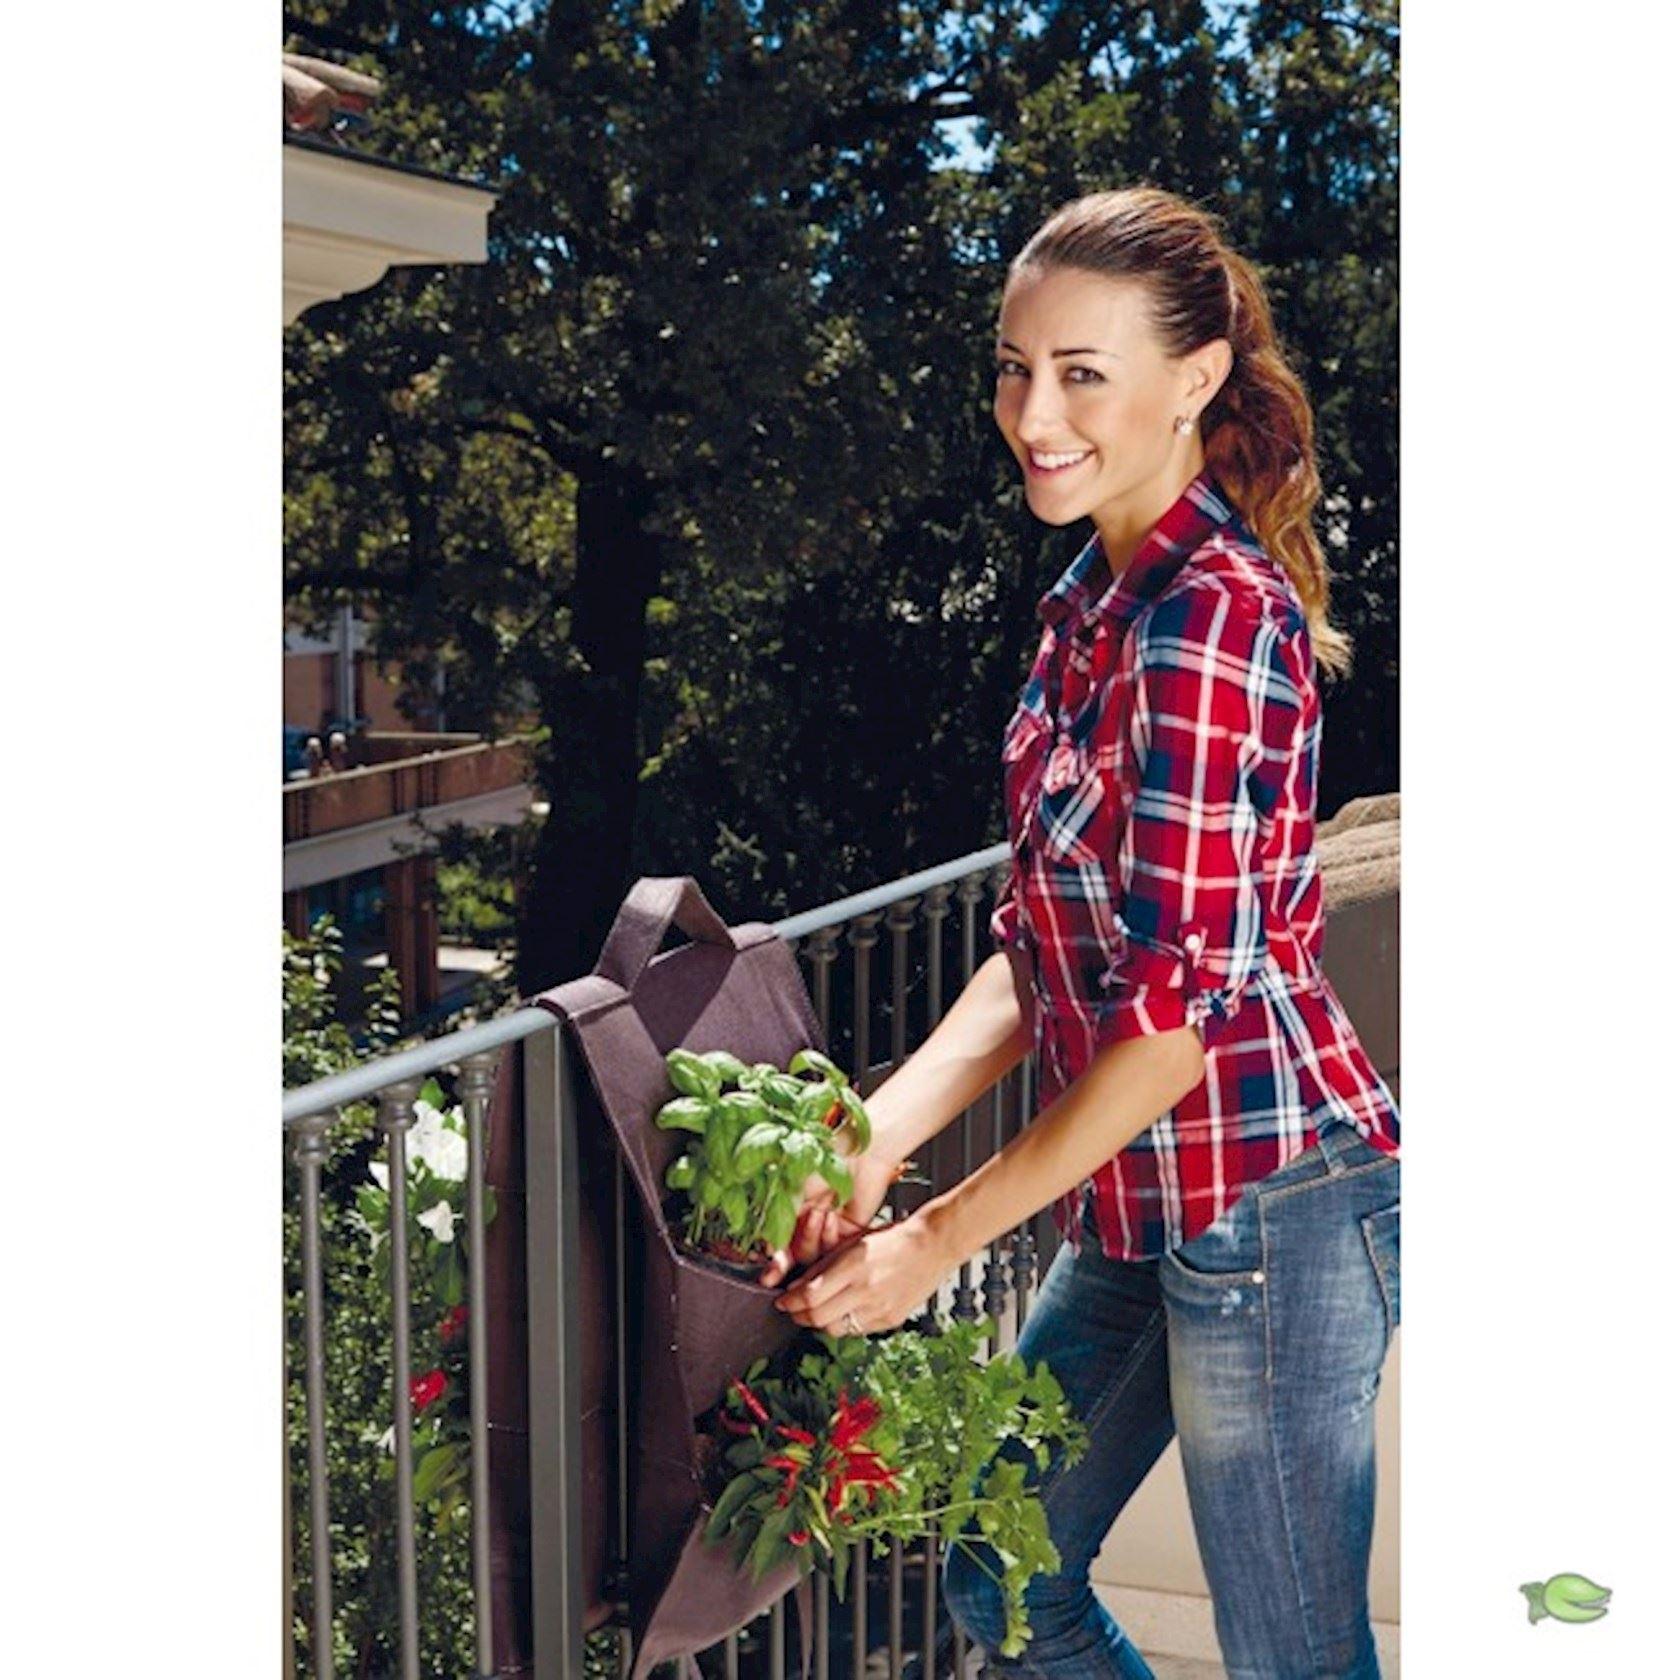 Balcony-Hugger-41-x-22-x-48cm-4-zakken-PE